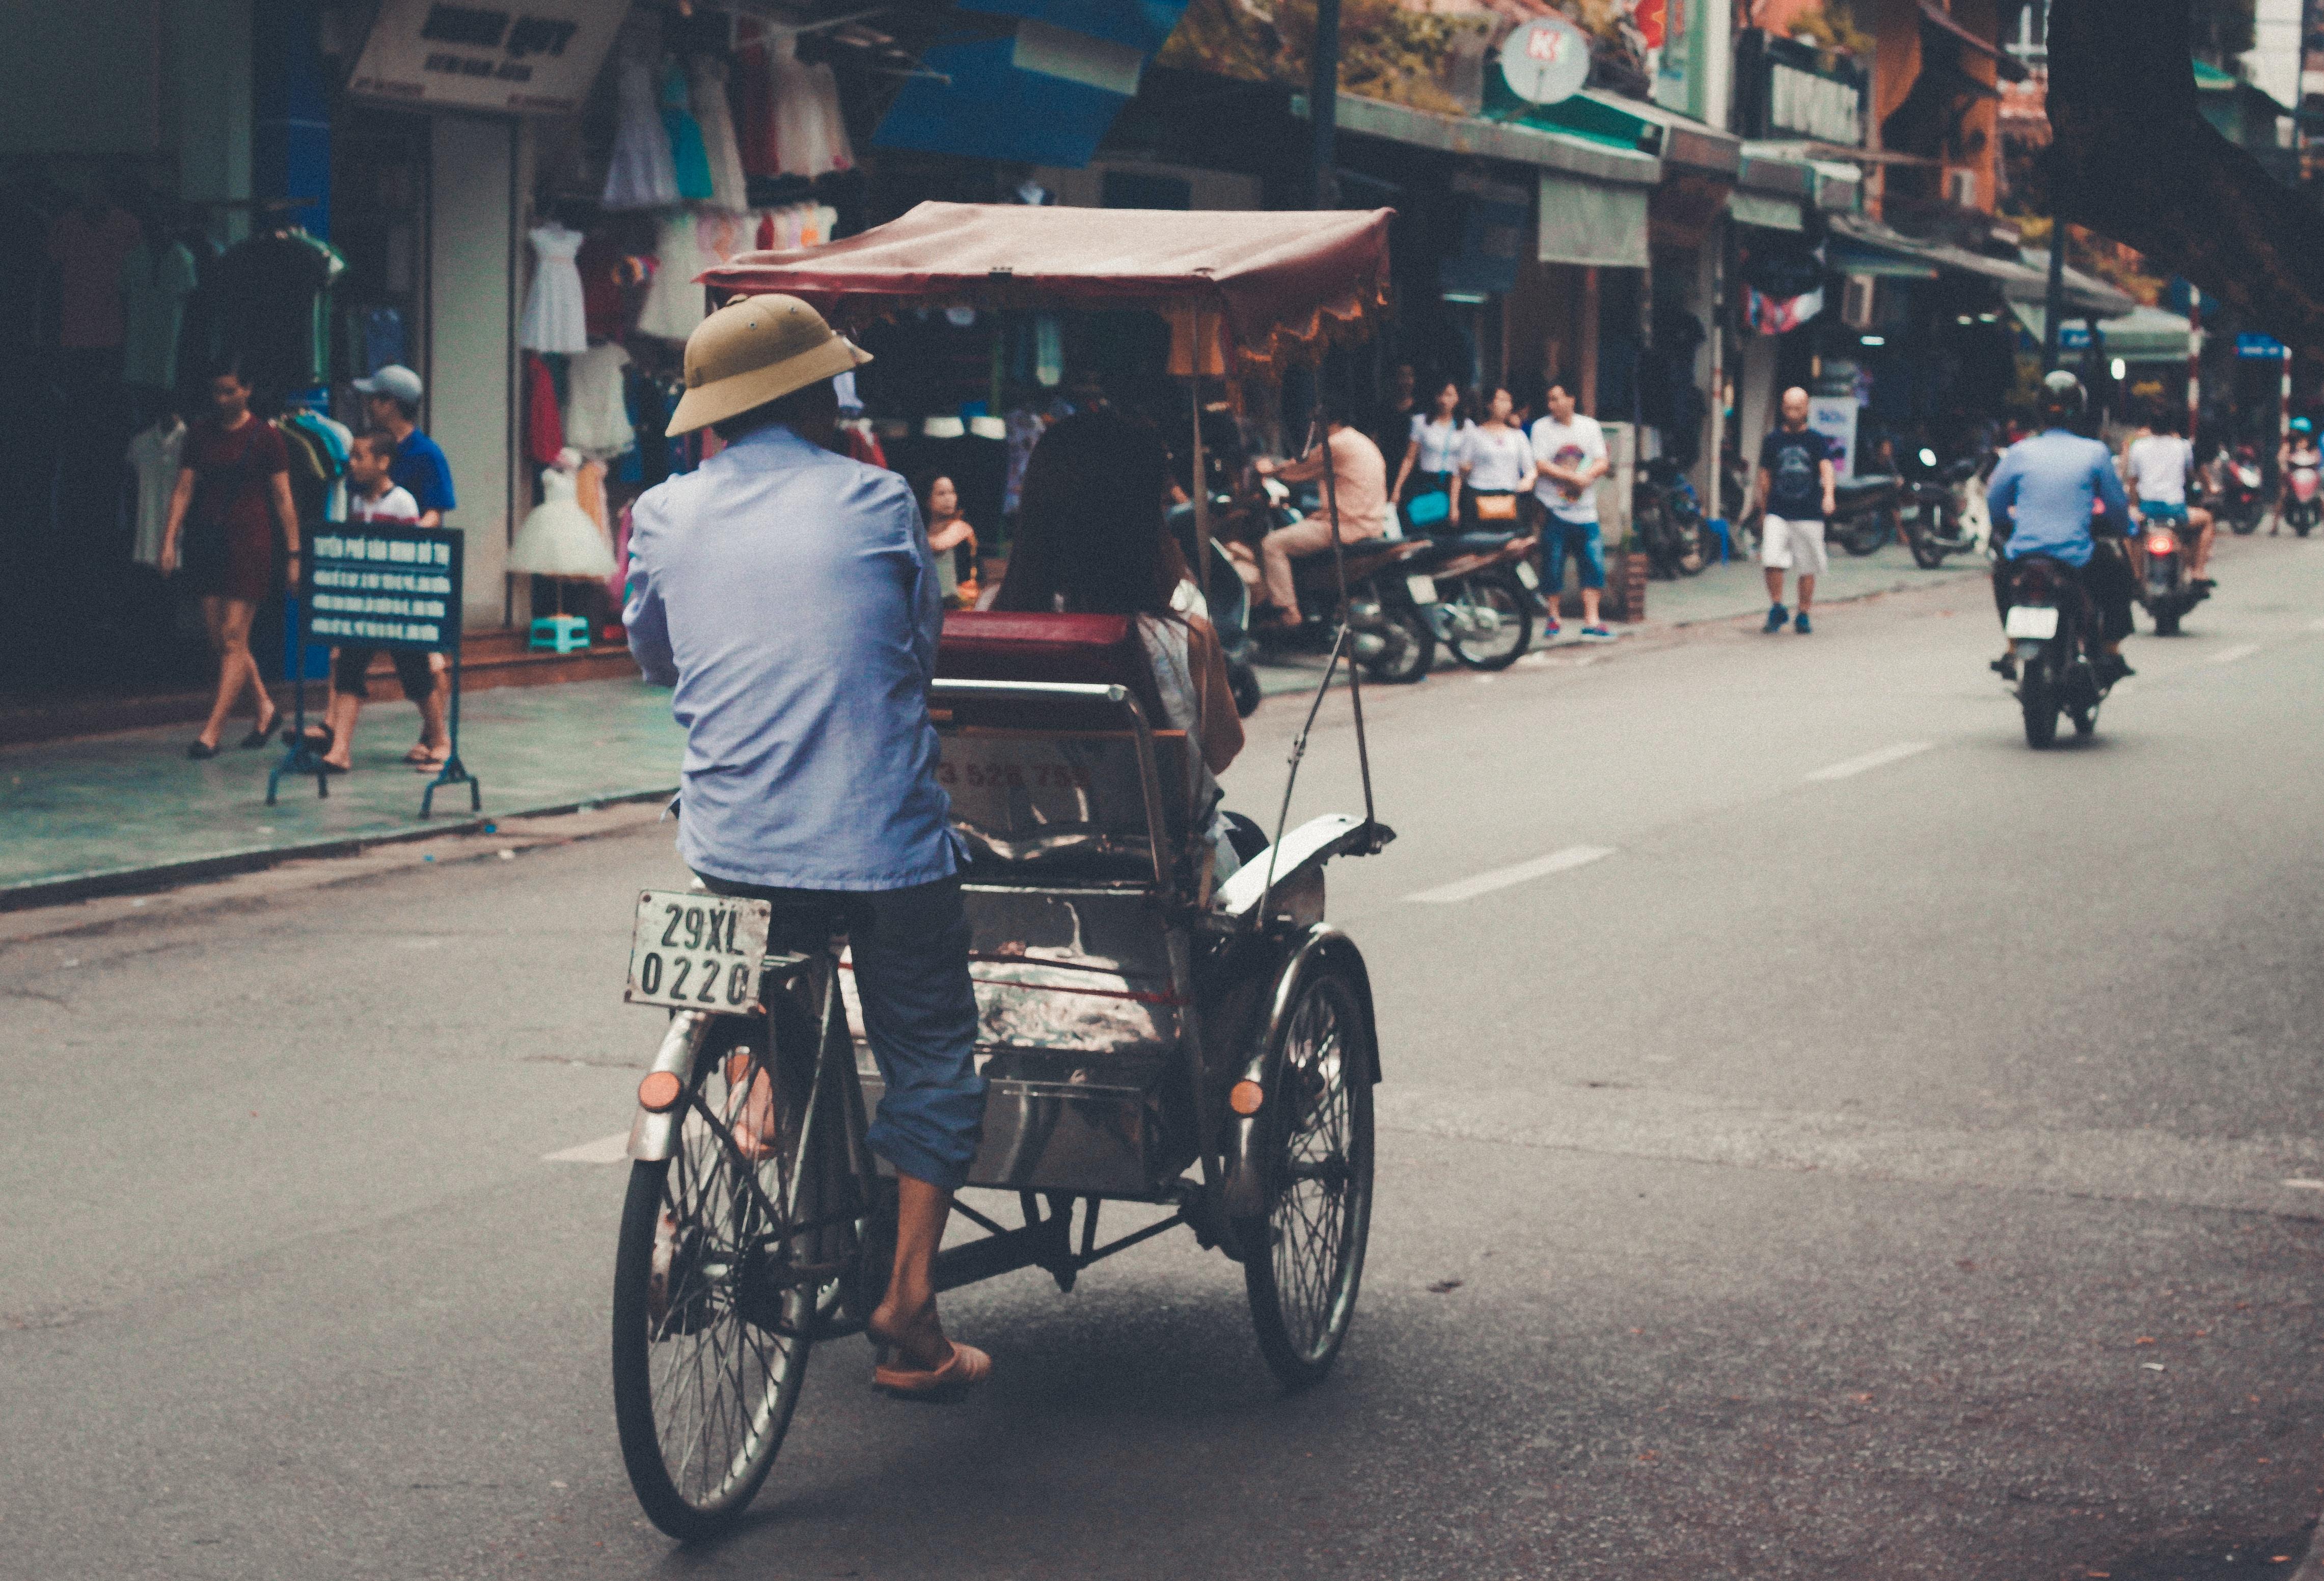 man wearing blue top riding on bicycle